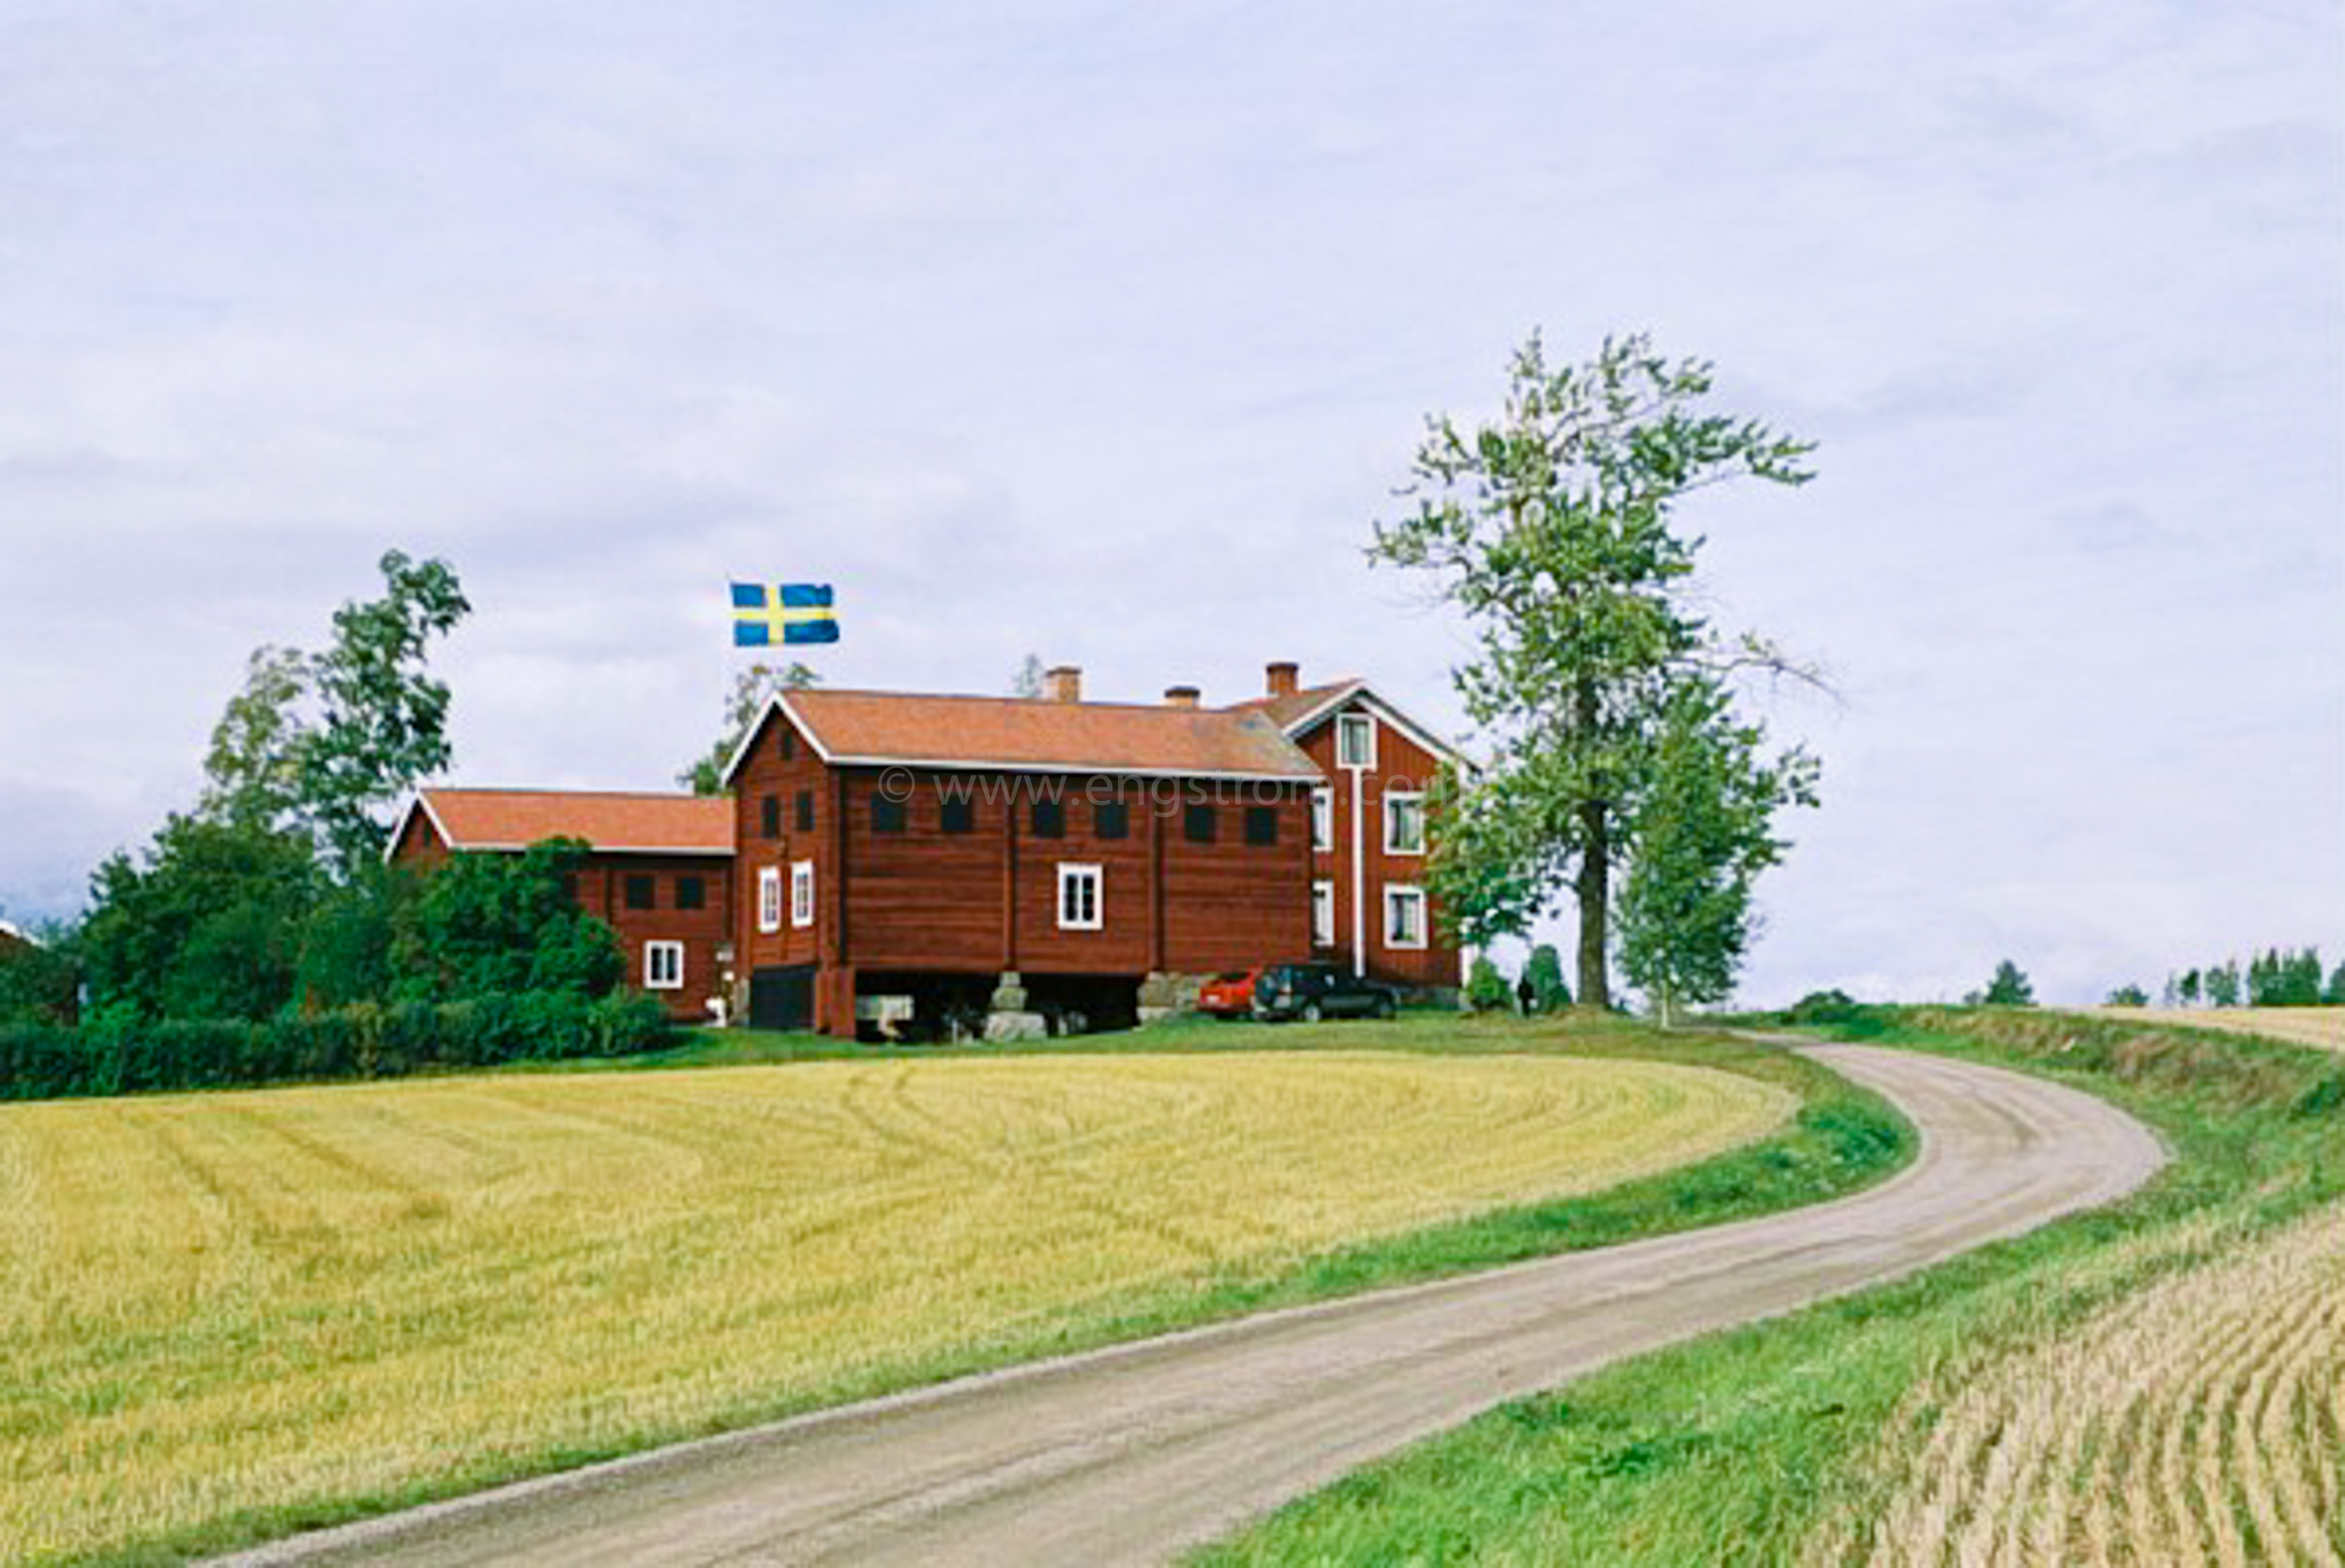 JE0425_175, Hälsingegård i Delsbo, Jonas Engström